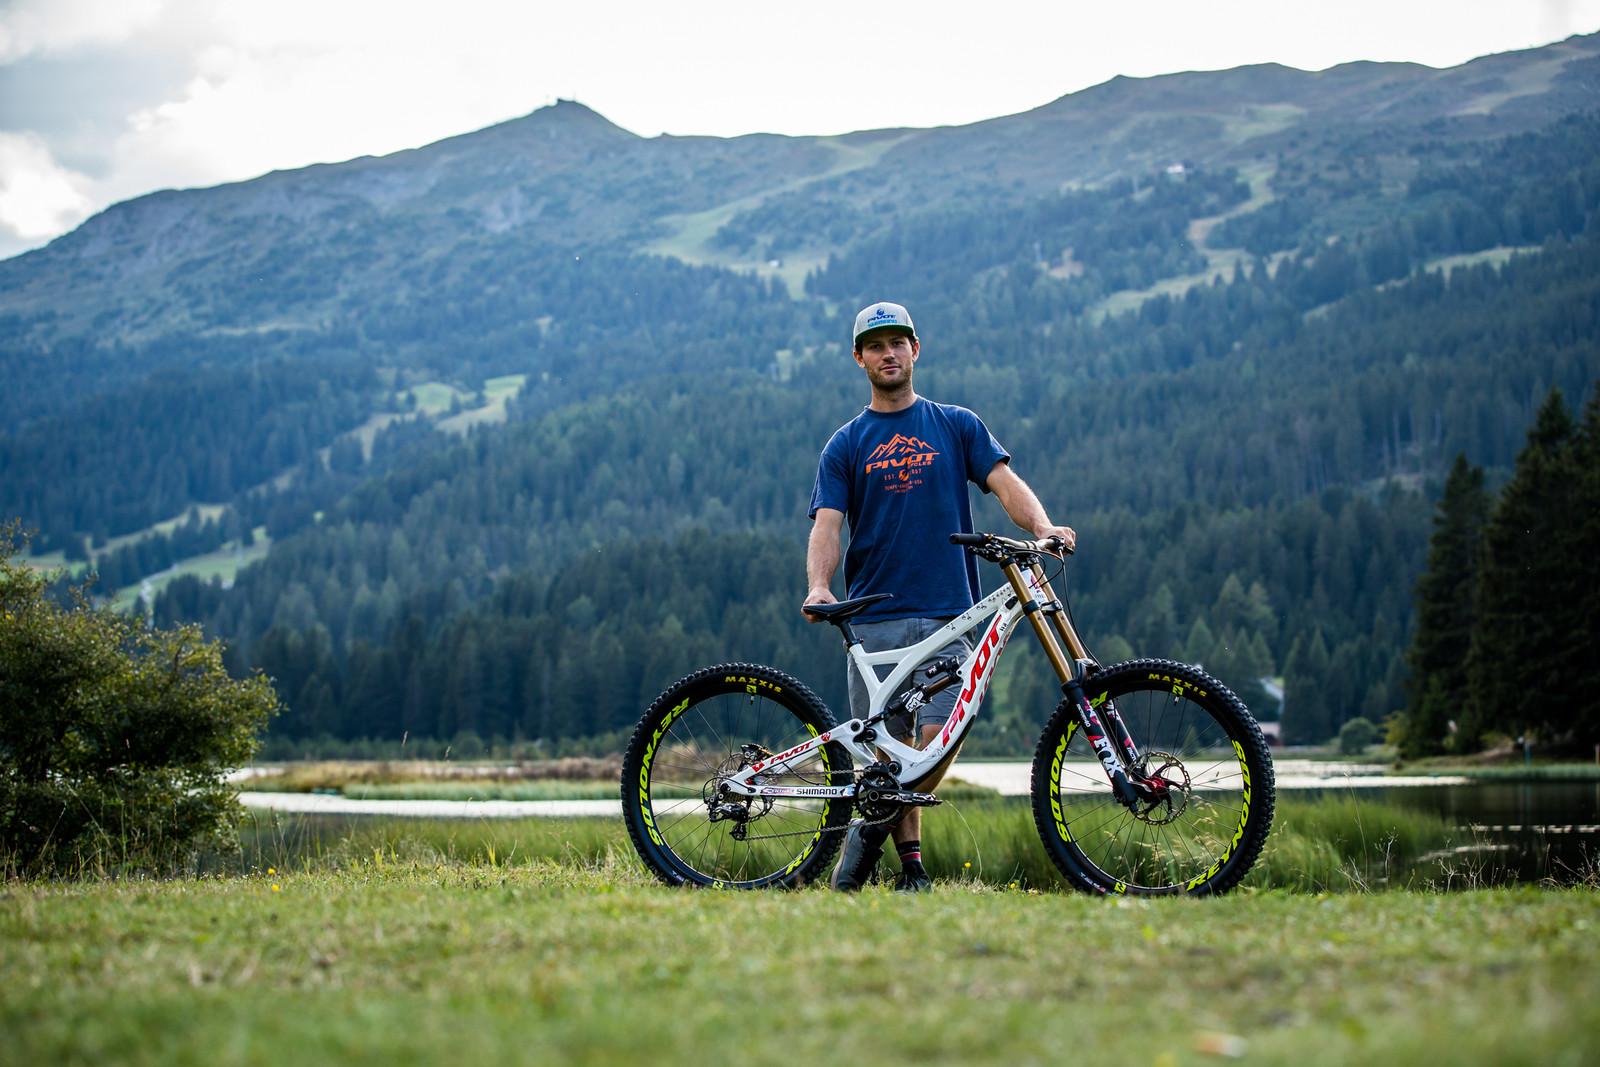 The Man Behind the Build - WORLD CHAMPS BIKE - Emilie Siegenthaler's Pivot Phoenix - Mountain Biking Pictures - Vital MTB